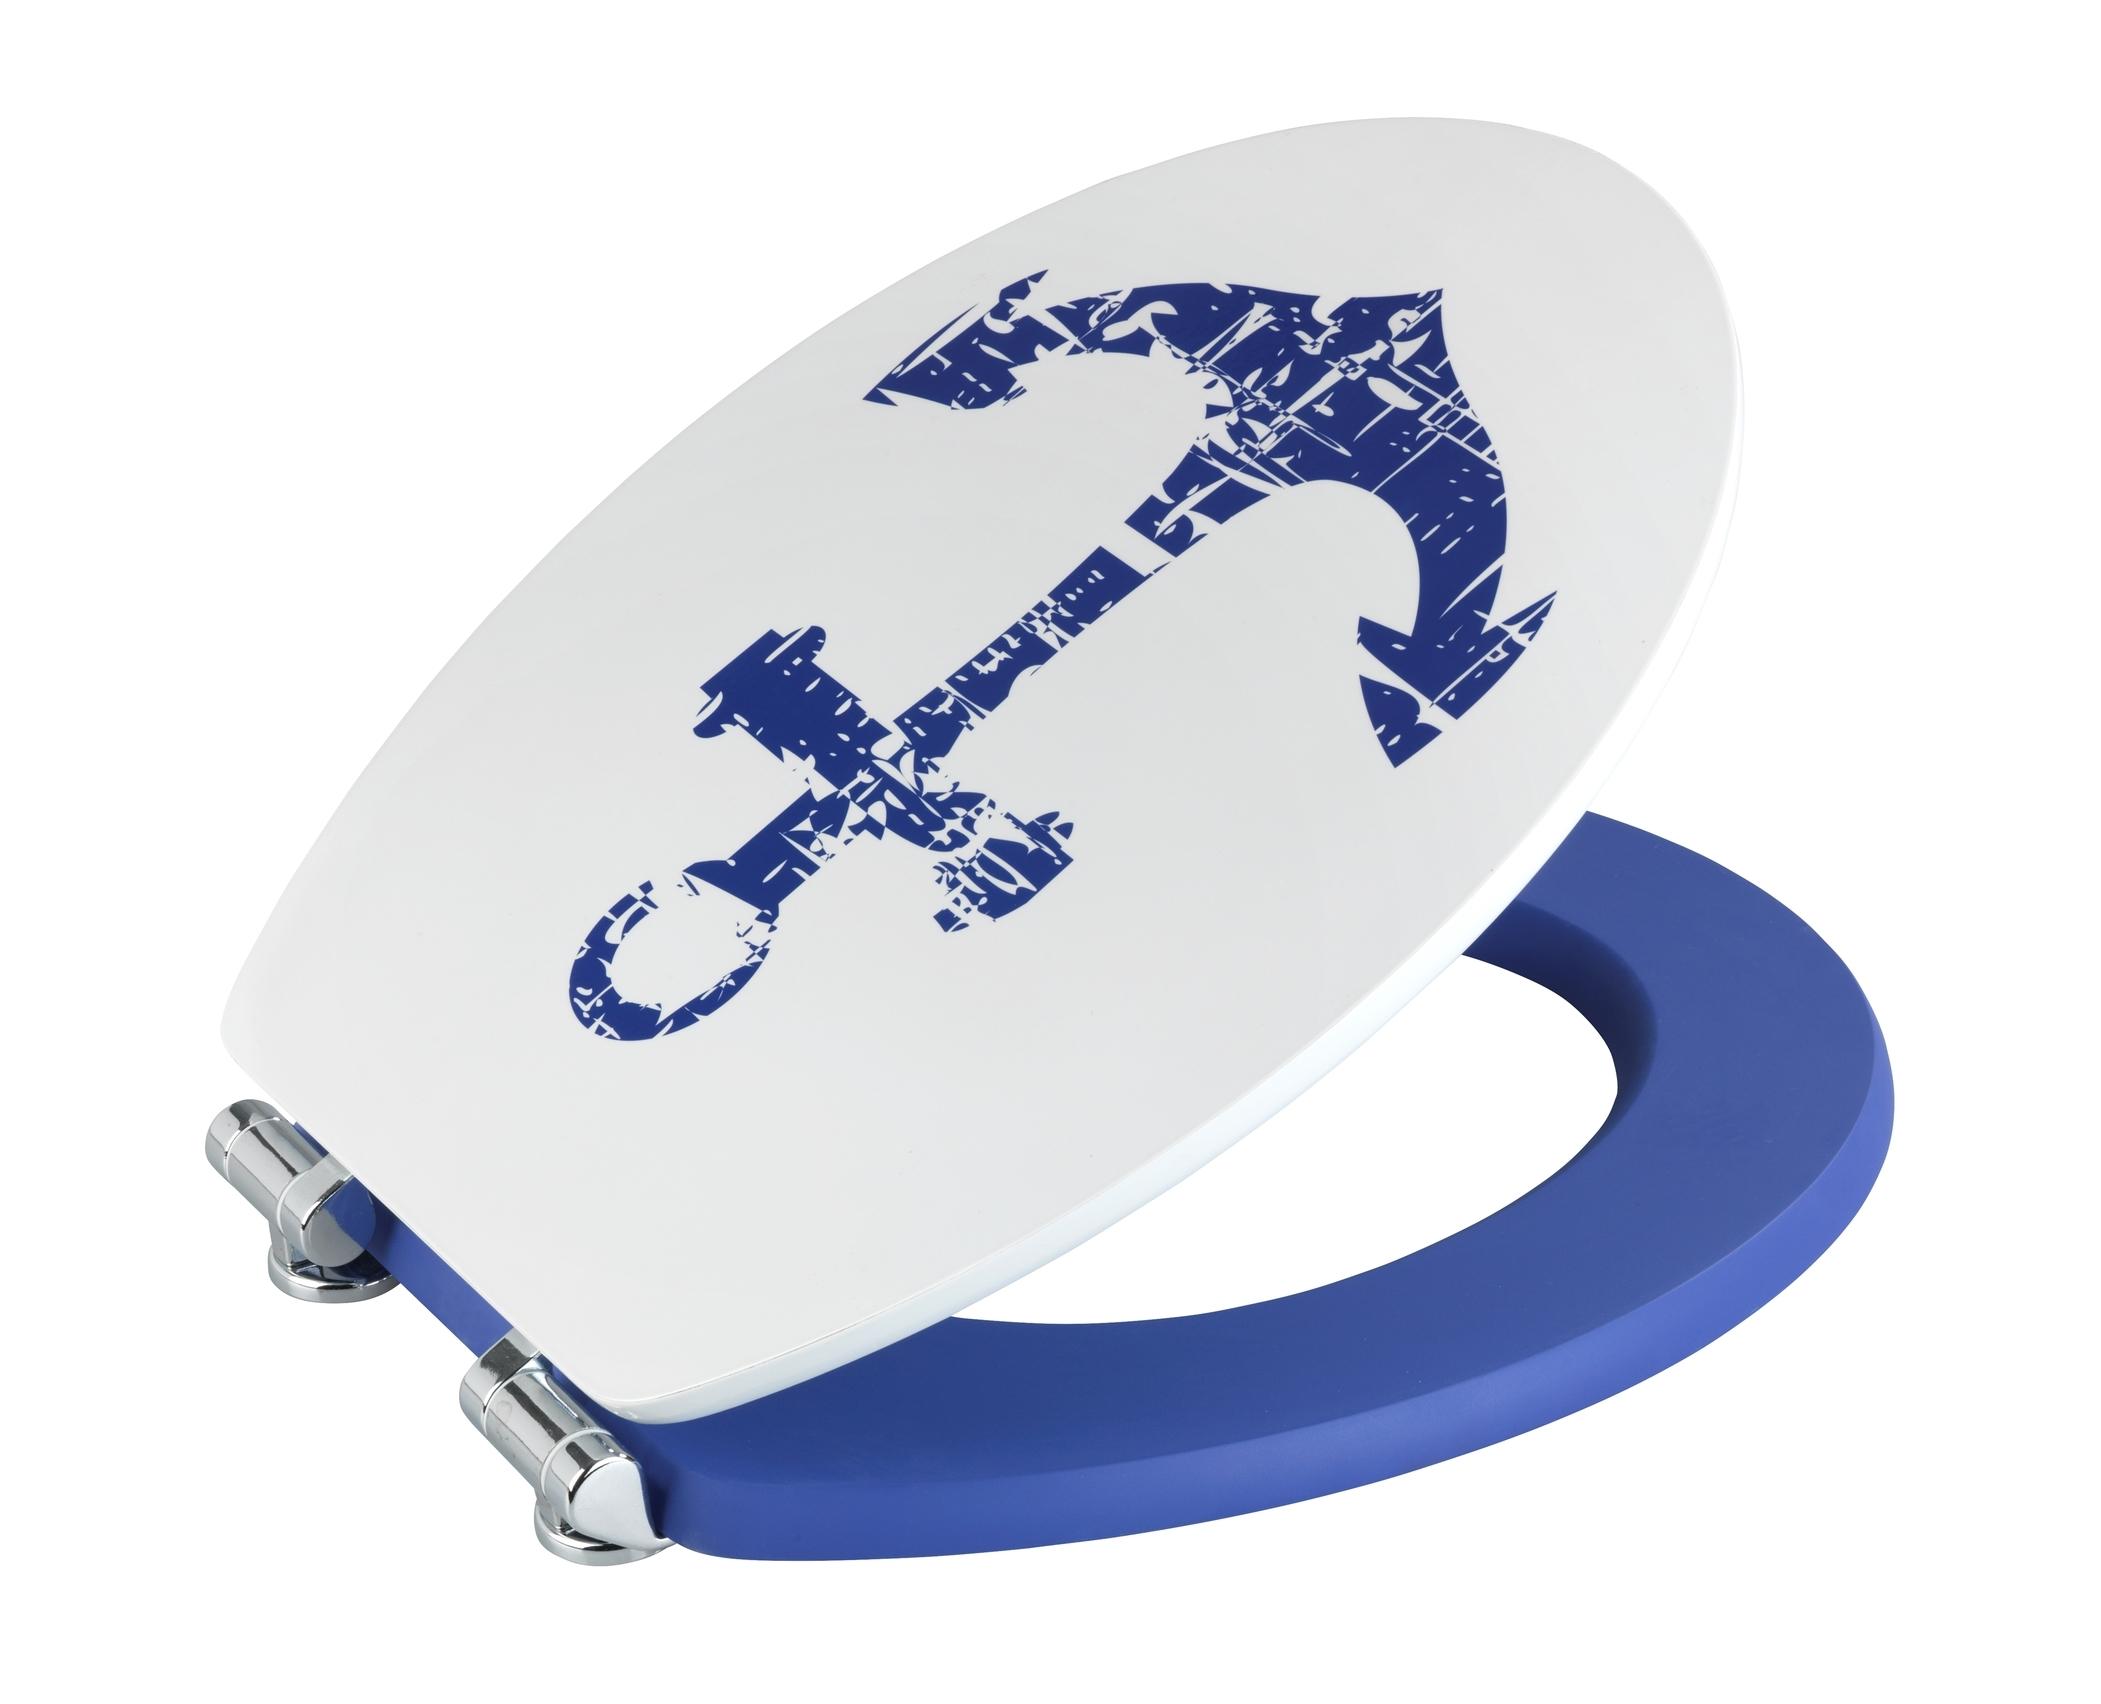 Capac toaleta din MDF, Shore Alb / Albastru, l37,5xA44 cm imagine